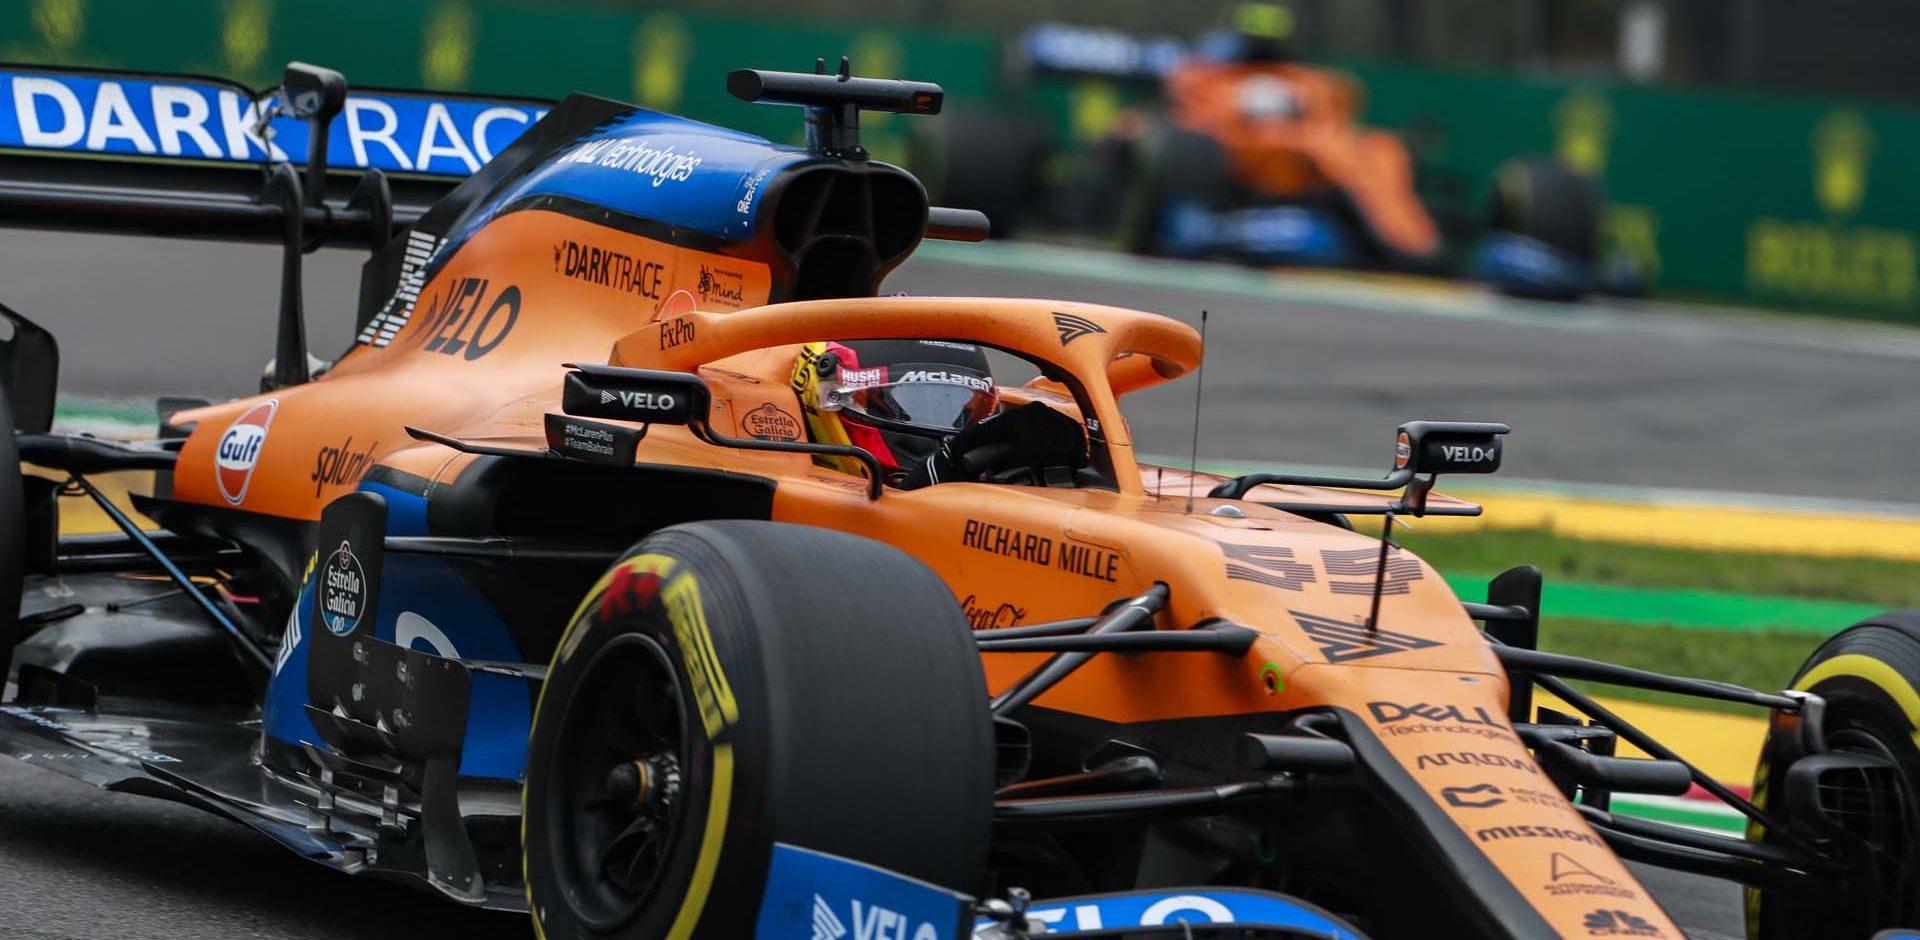 Carlos Sainz, McLaren MCL35, leads Lando Norris, McLaren MCL35, through a chicane